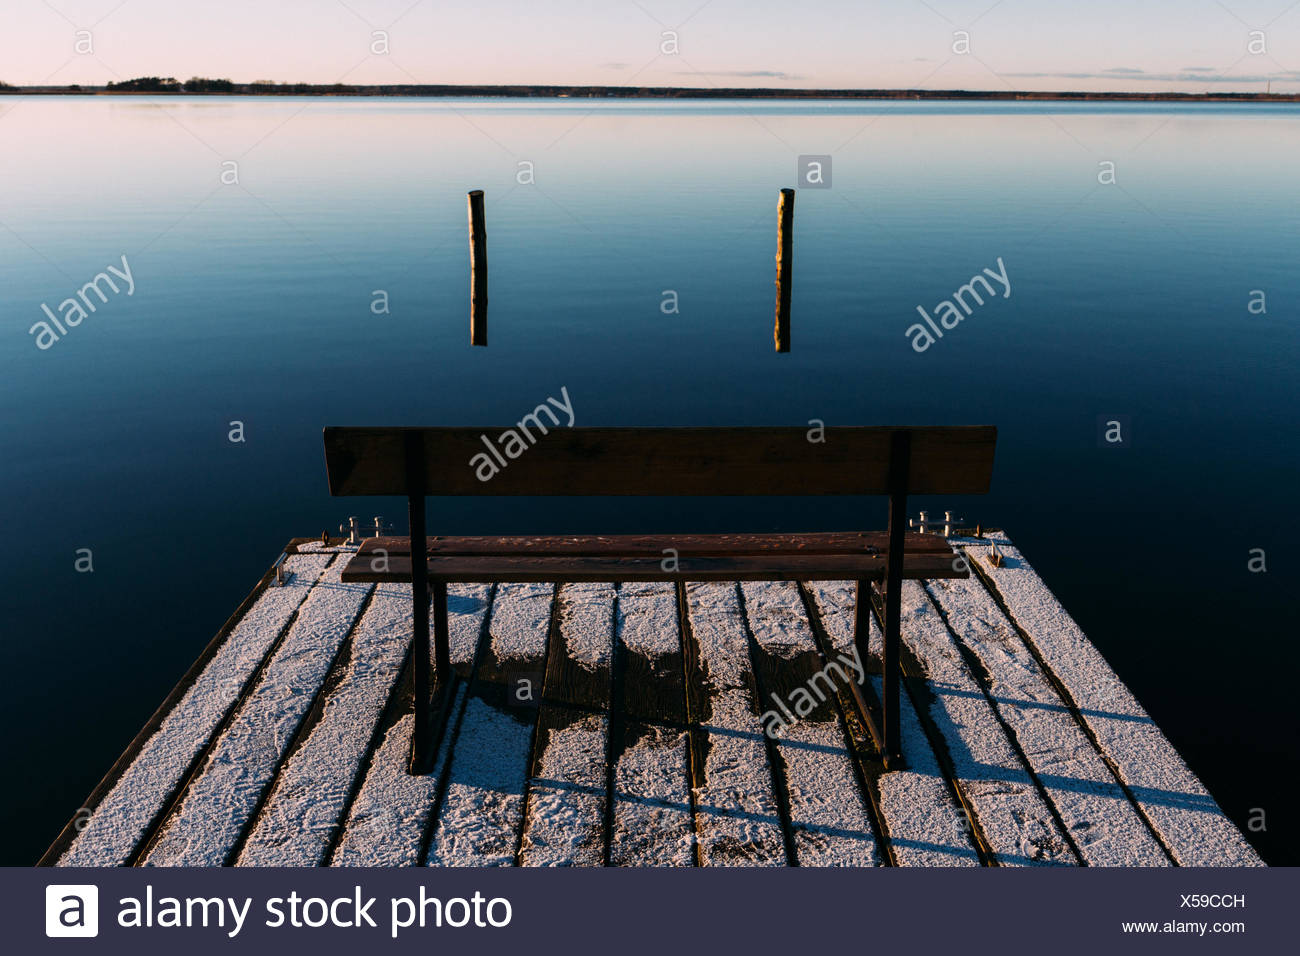 Empty Bench On Pier - Stock Image